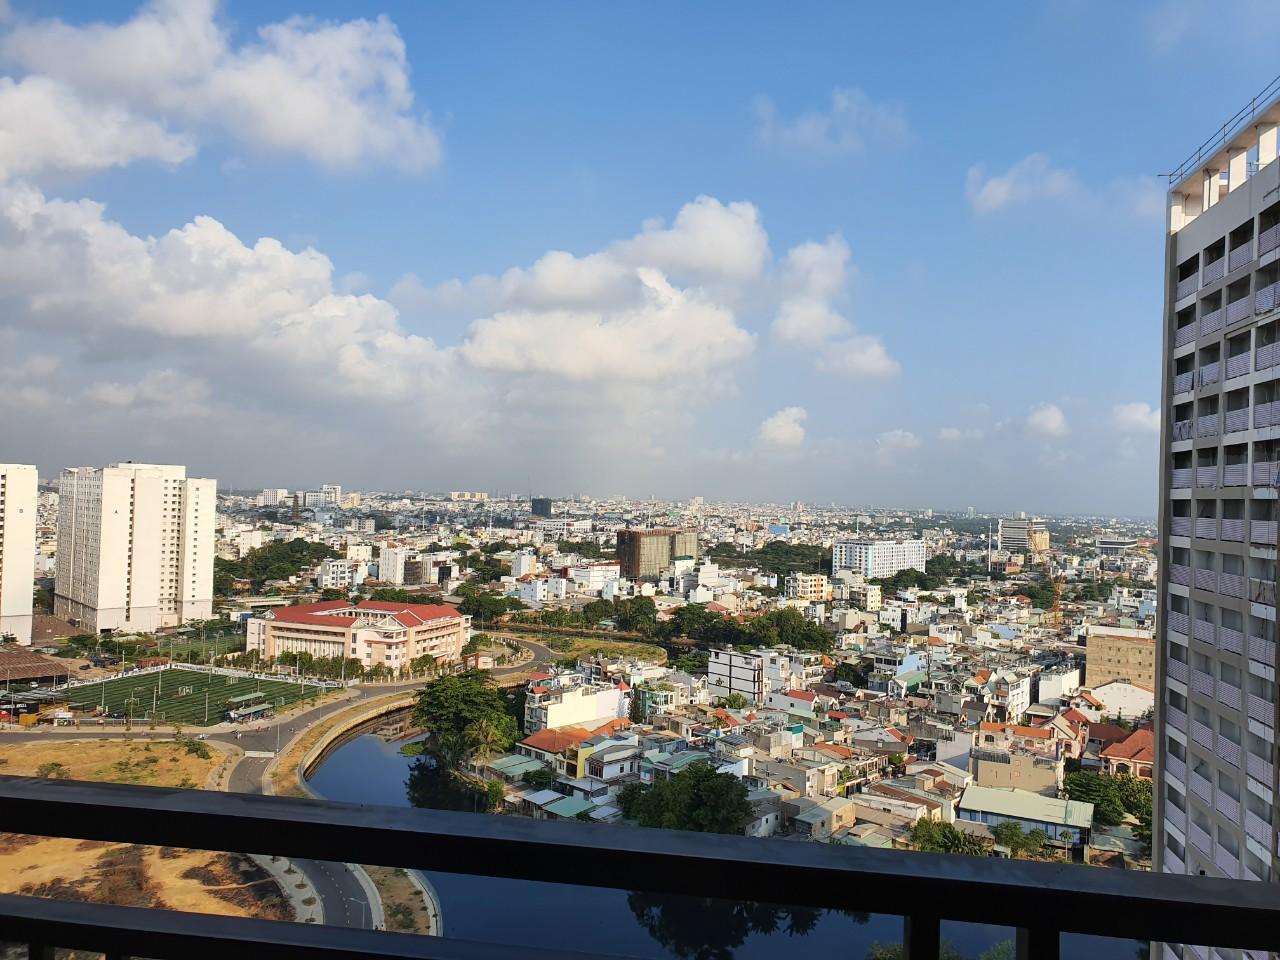 hinh-anh-thuc-te-richmond-city